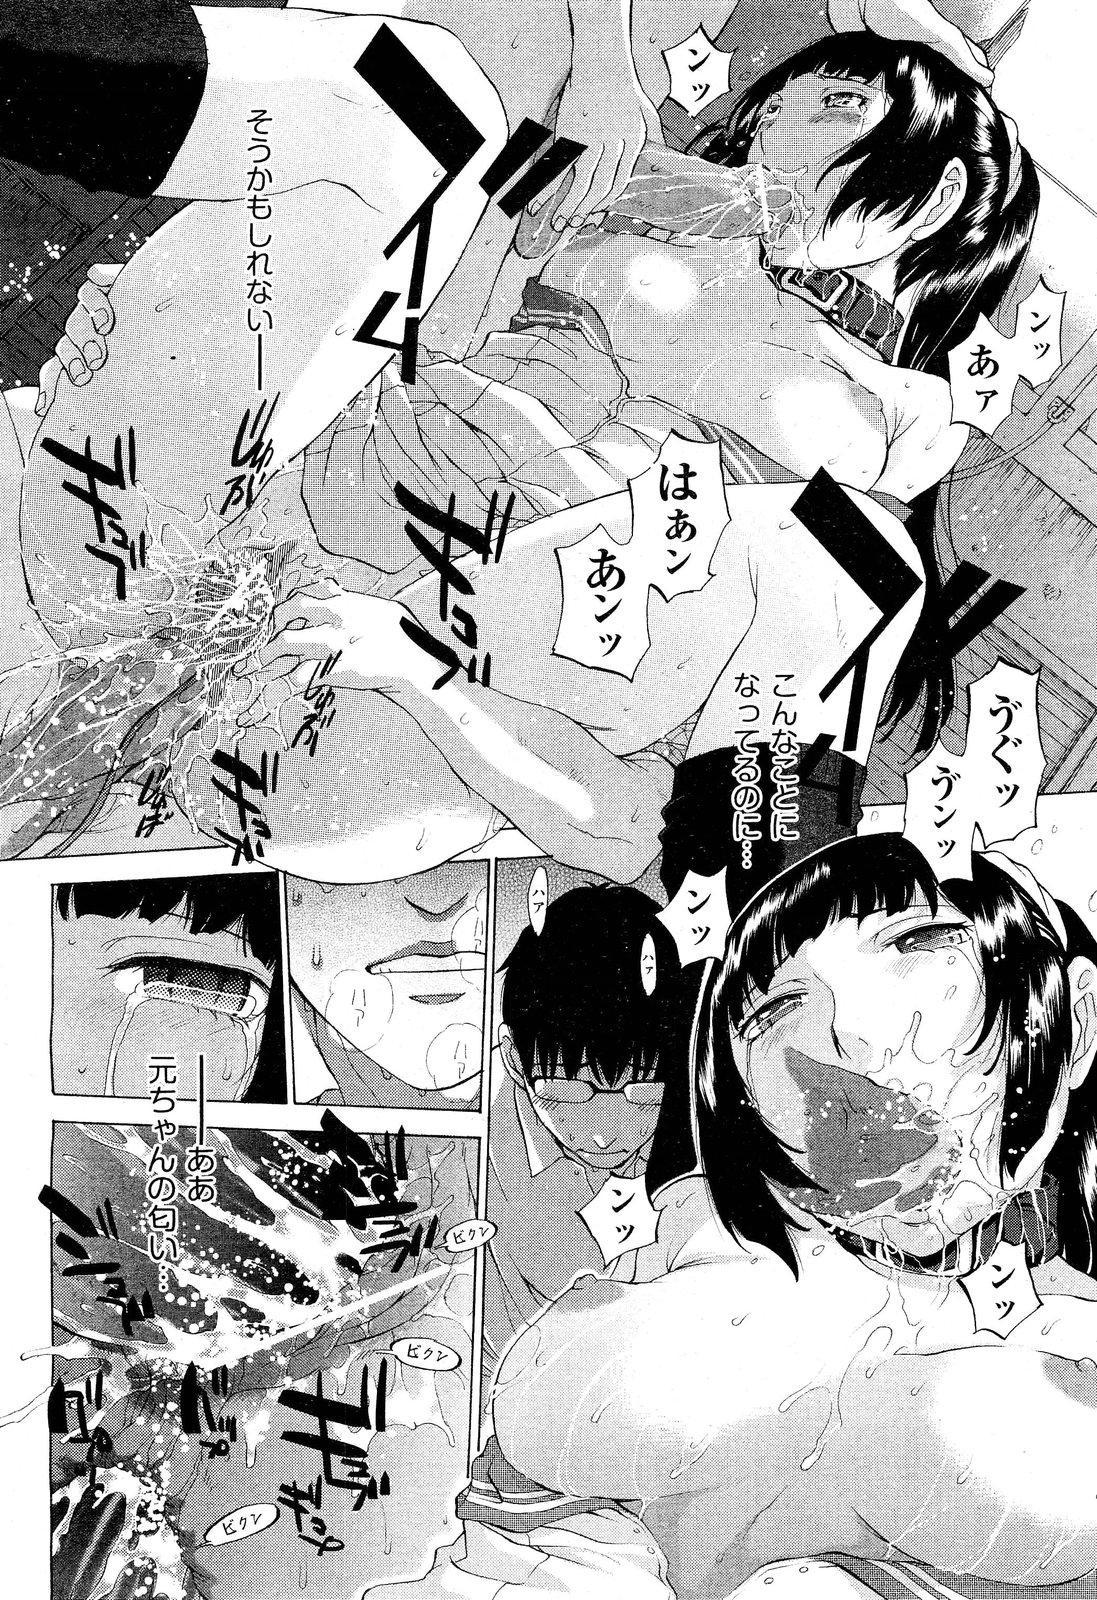 Hanazono 144